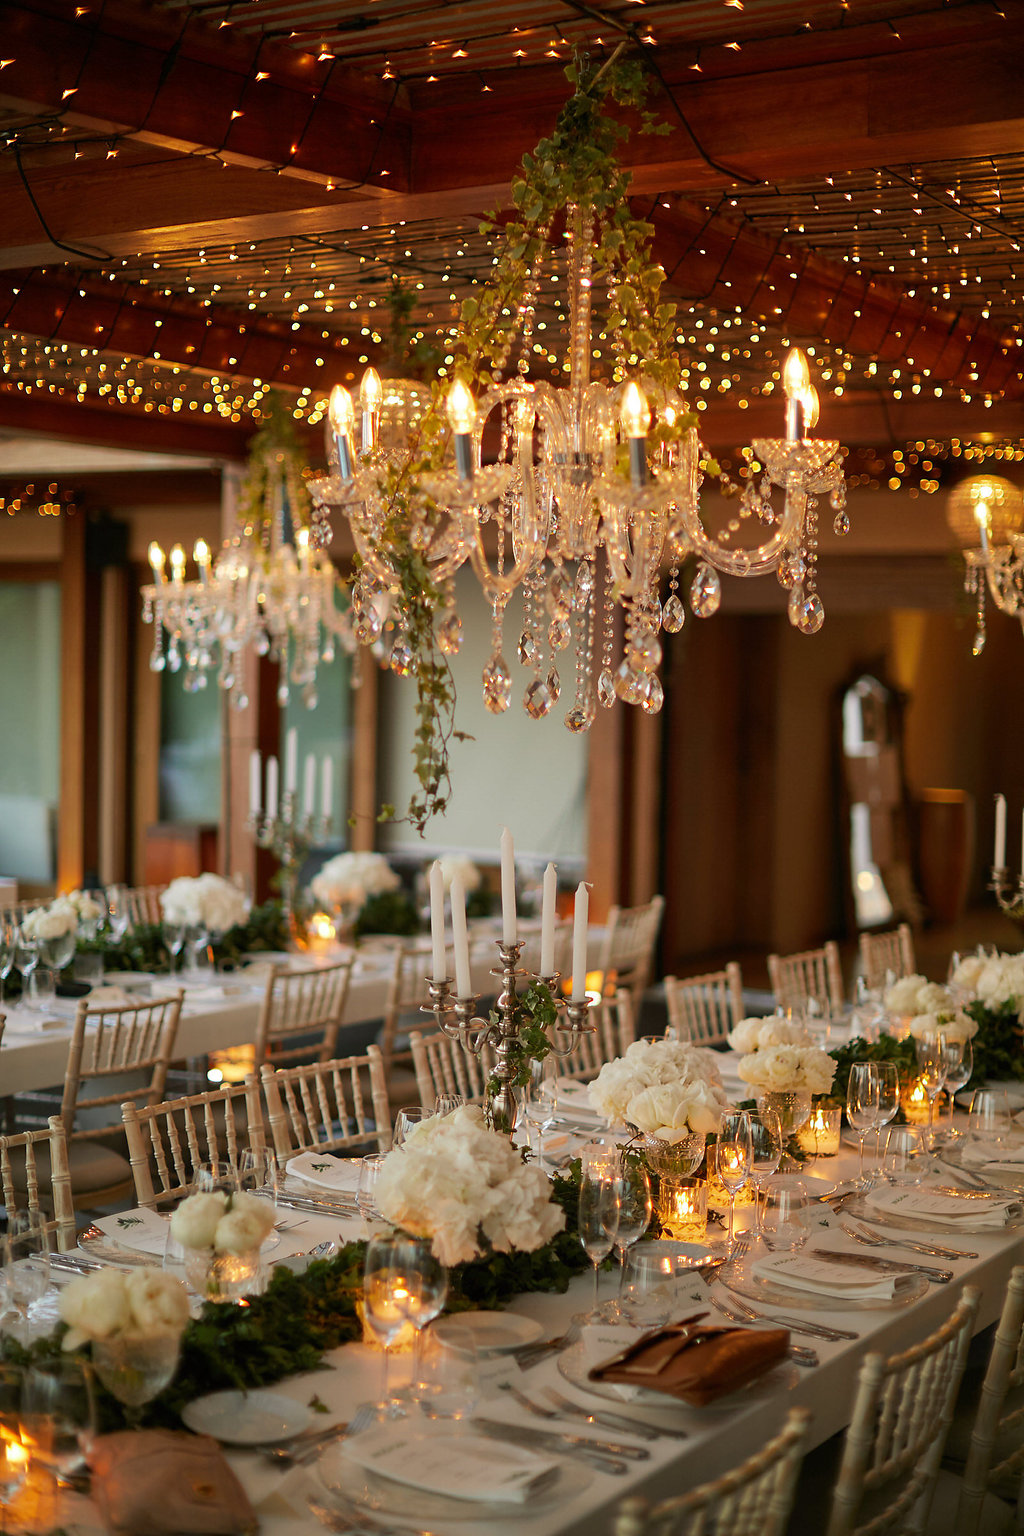 romantic fairy light weddings - photo by Sotiris Tsakanikas https://ruffledblog.com/chic-sunset-wedding-on-the-athens-riviera